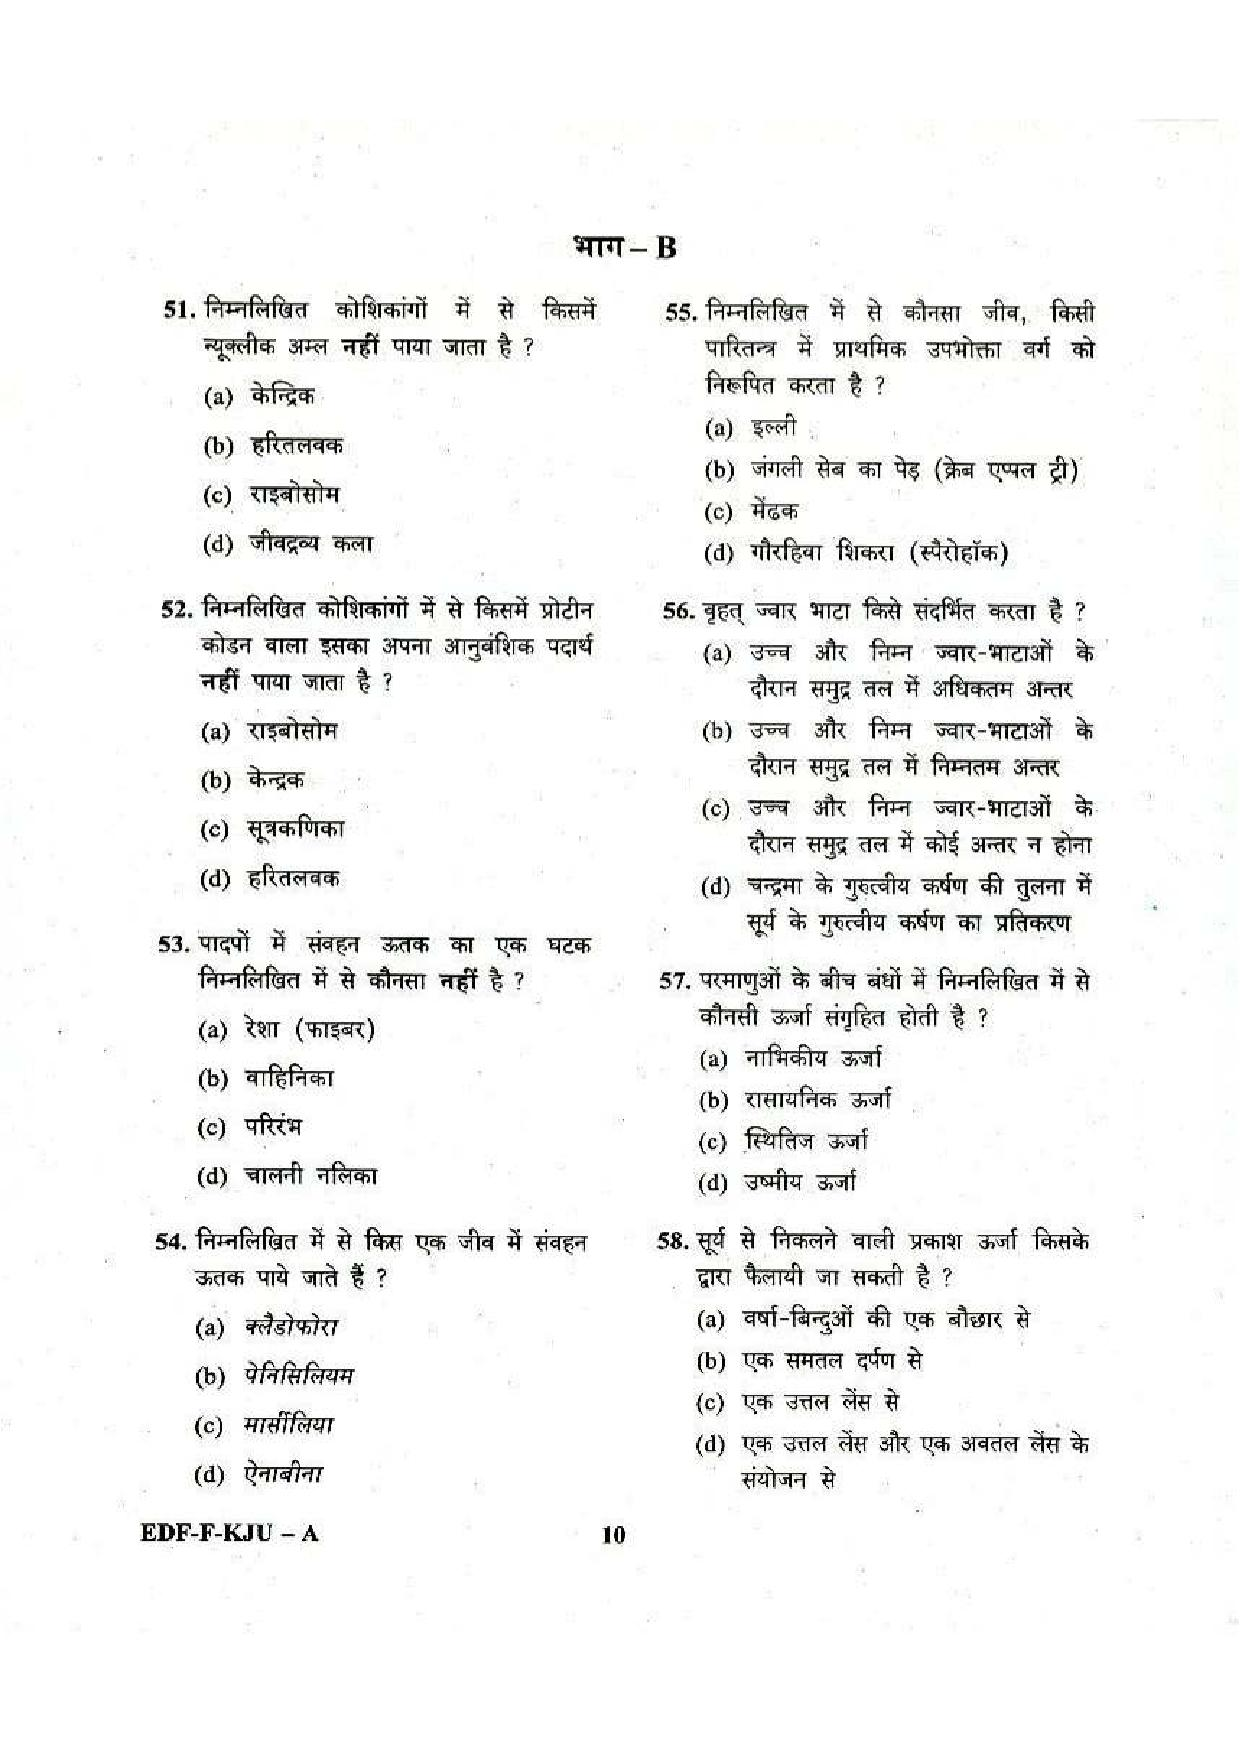 NDA Paper 1 GAT 2019 Question Paper